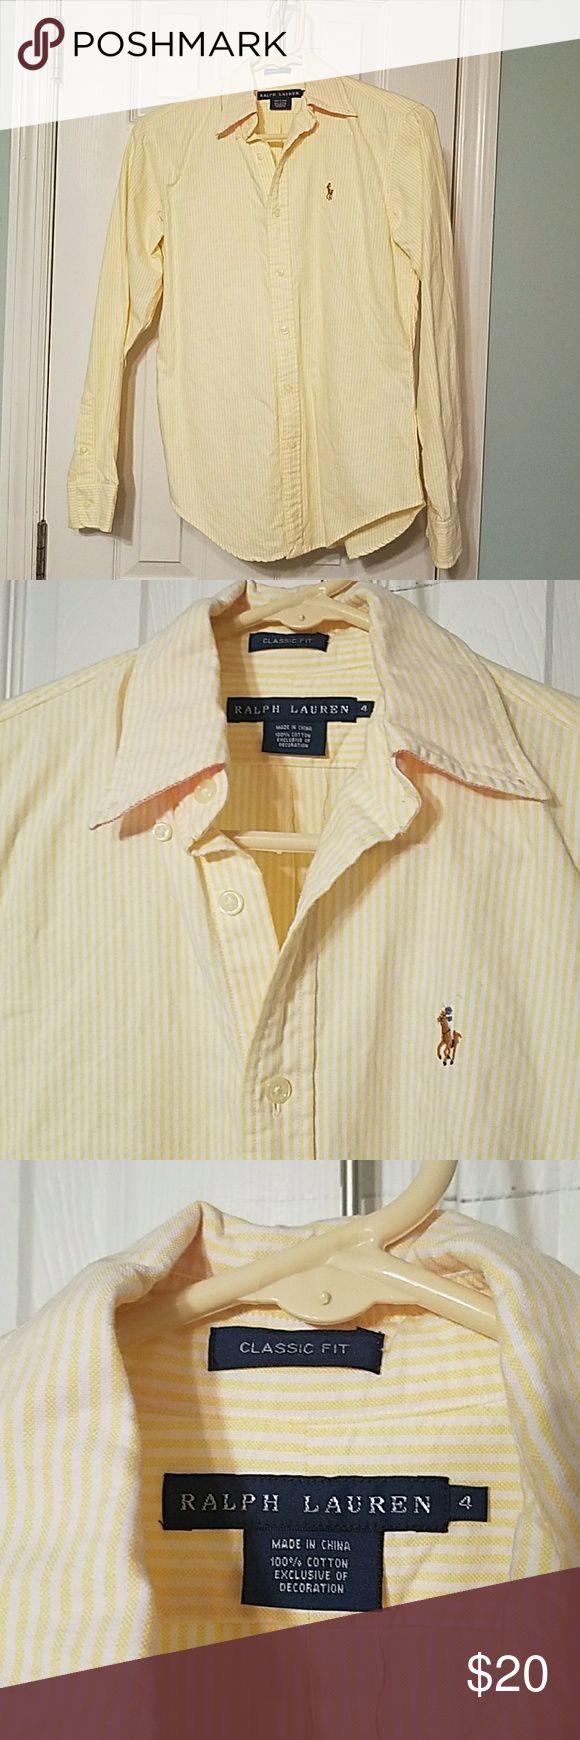 Ralph Lauren women's Oxford button down Yellow and white striped long sleeve button down Ralph Lauren Oxford , classic fit size 4. EUC 100% Cotton  Multi-color horse emblem Ralph Lauren Tops Button Down Shirts